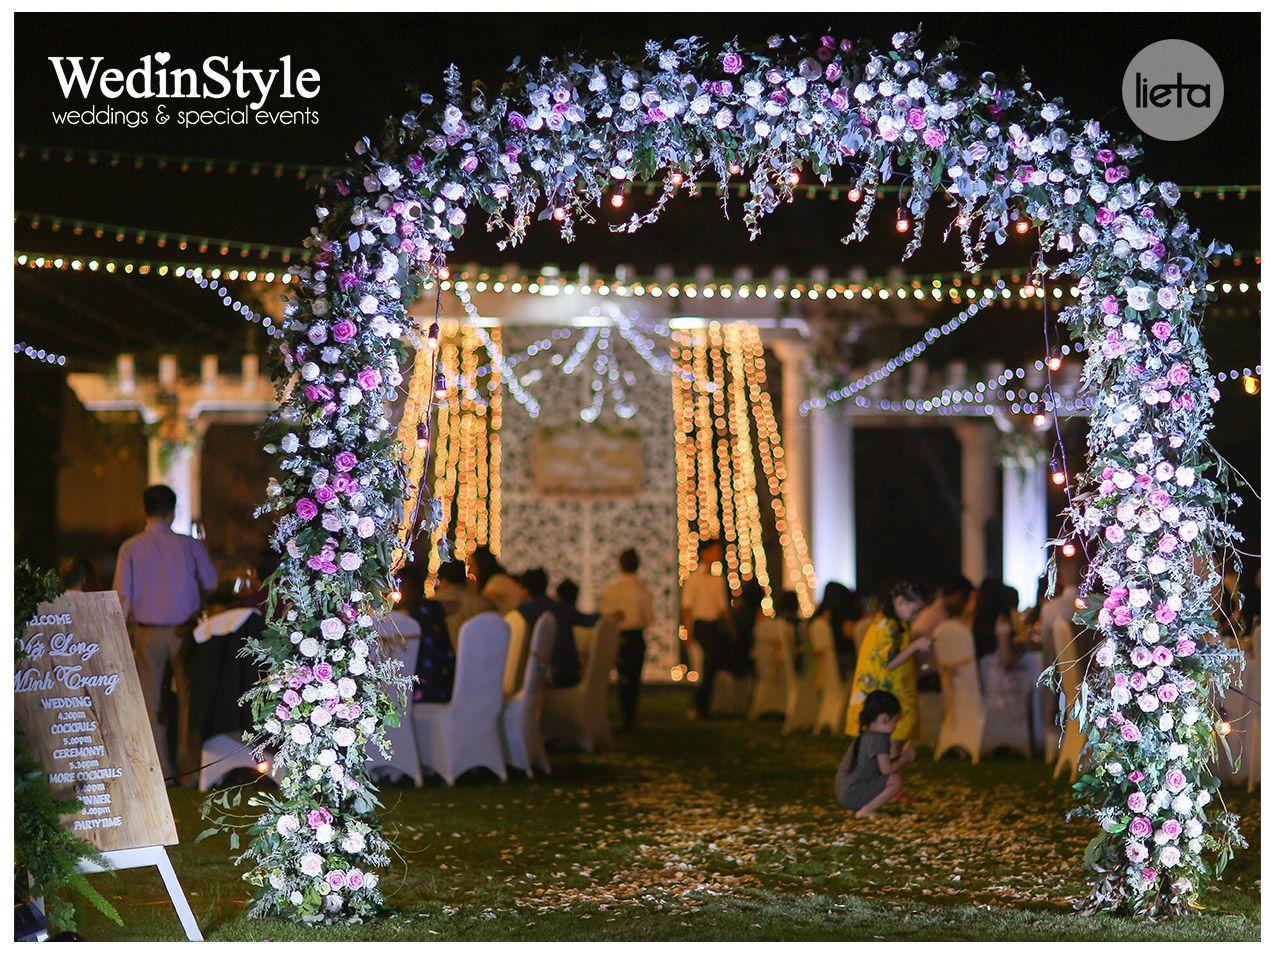 Wedding welcome gate outdoor rustic wedding by wedinstyle in wedding welcome gate junglespirit Gallery